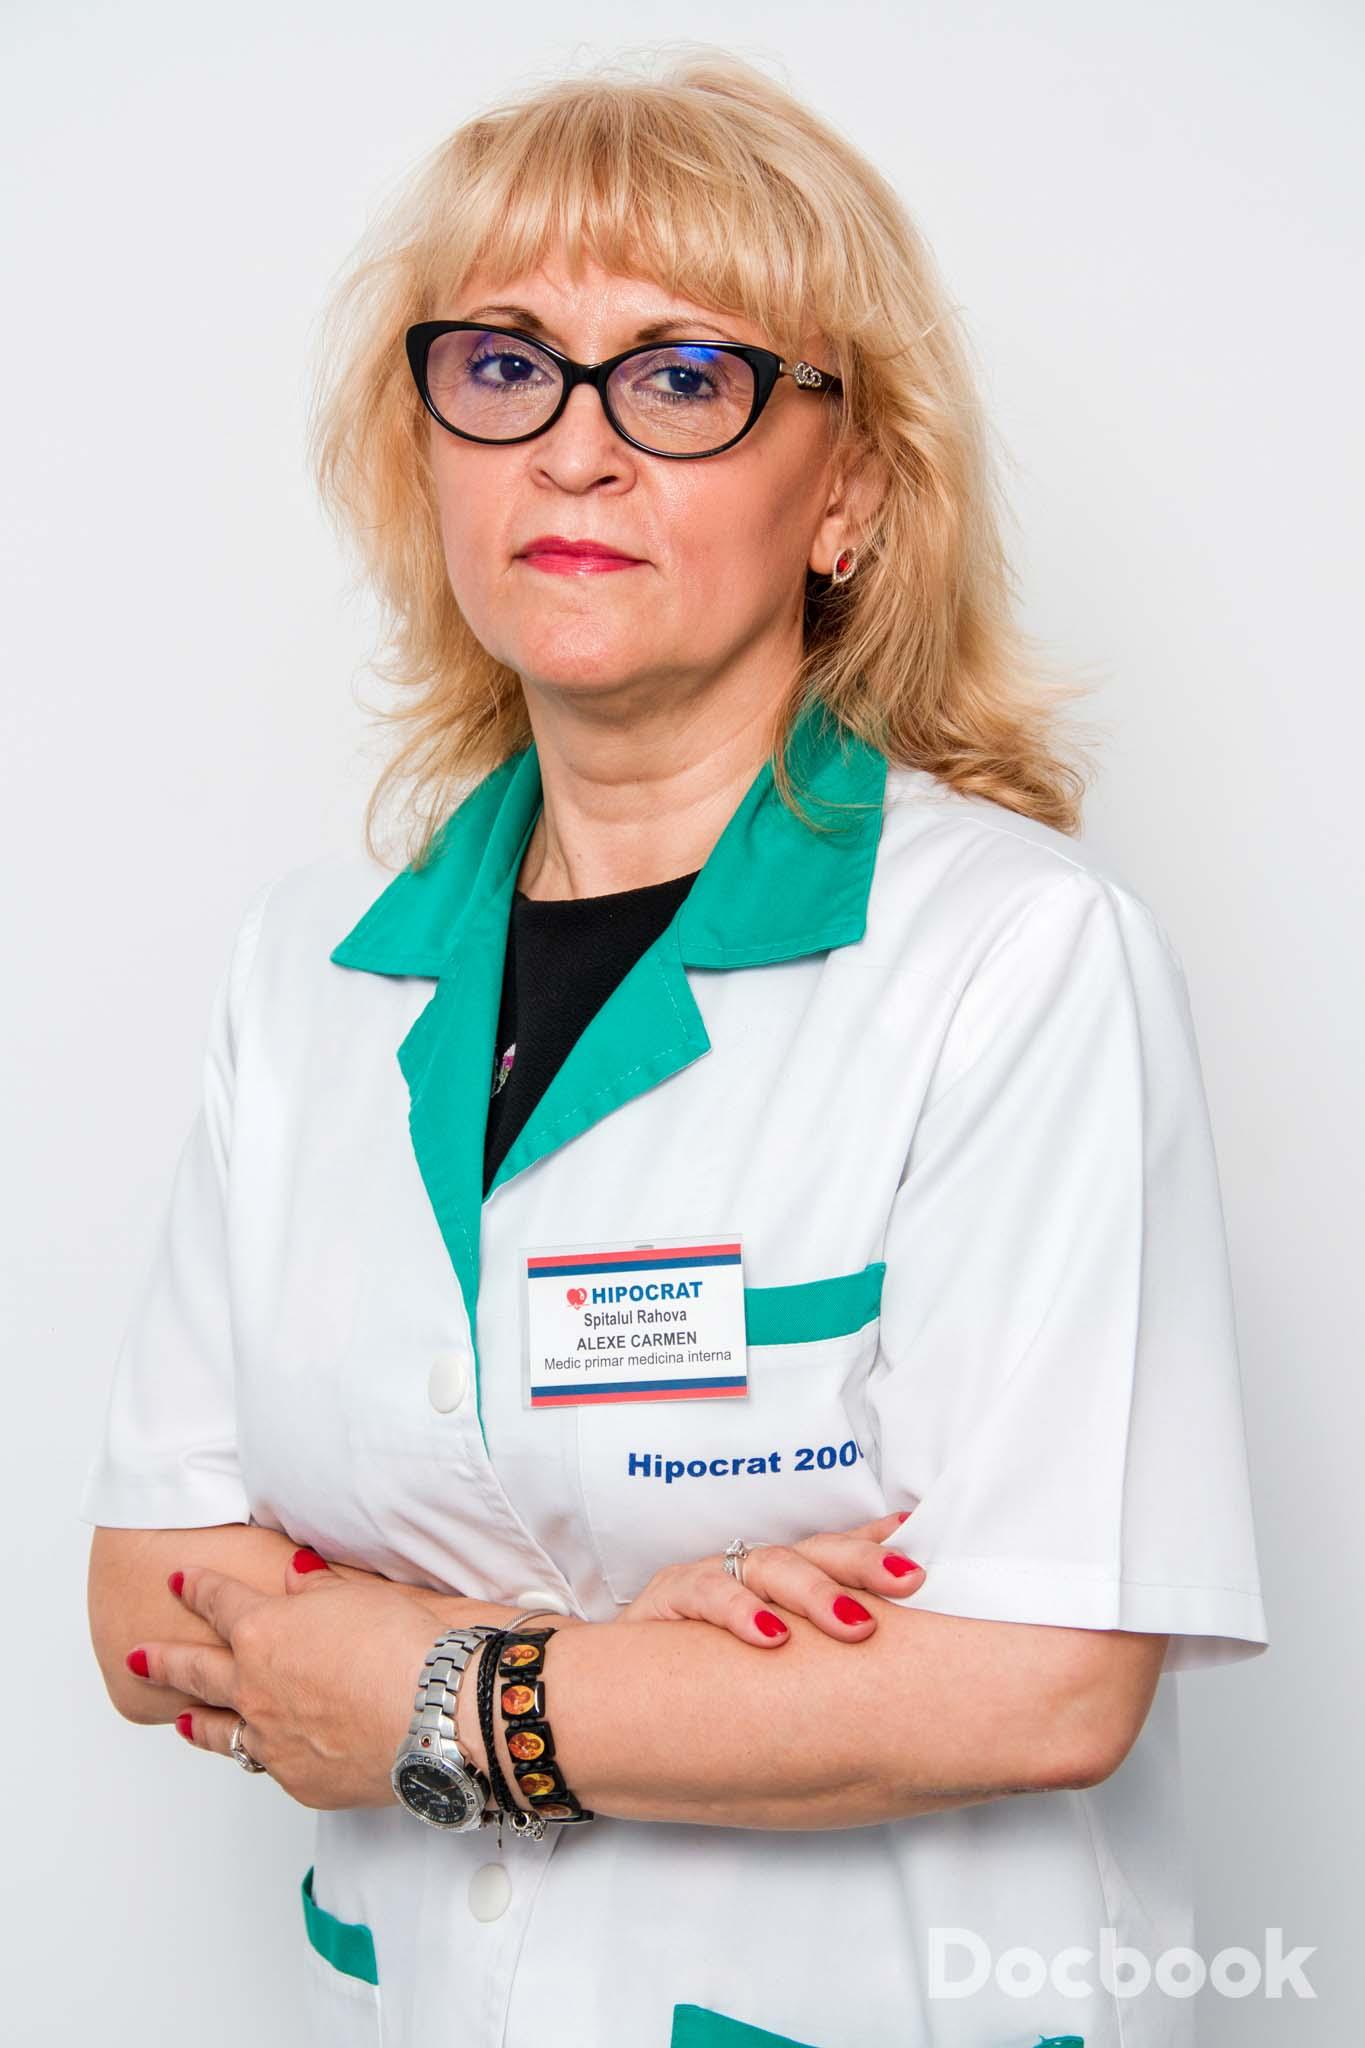 Dr. Carmen Alexe